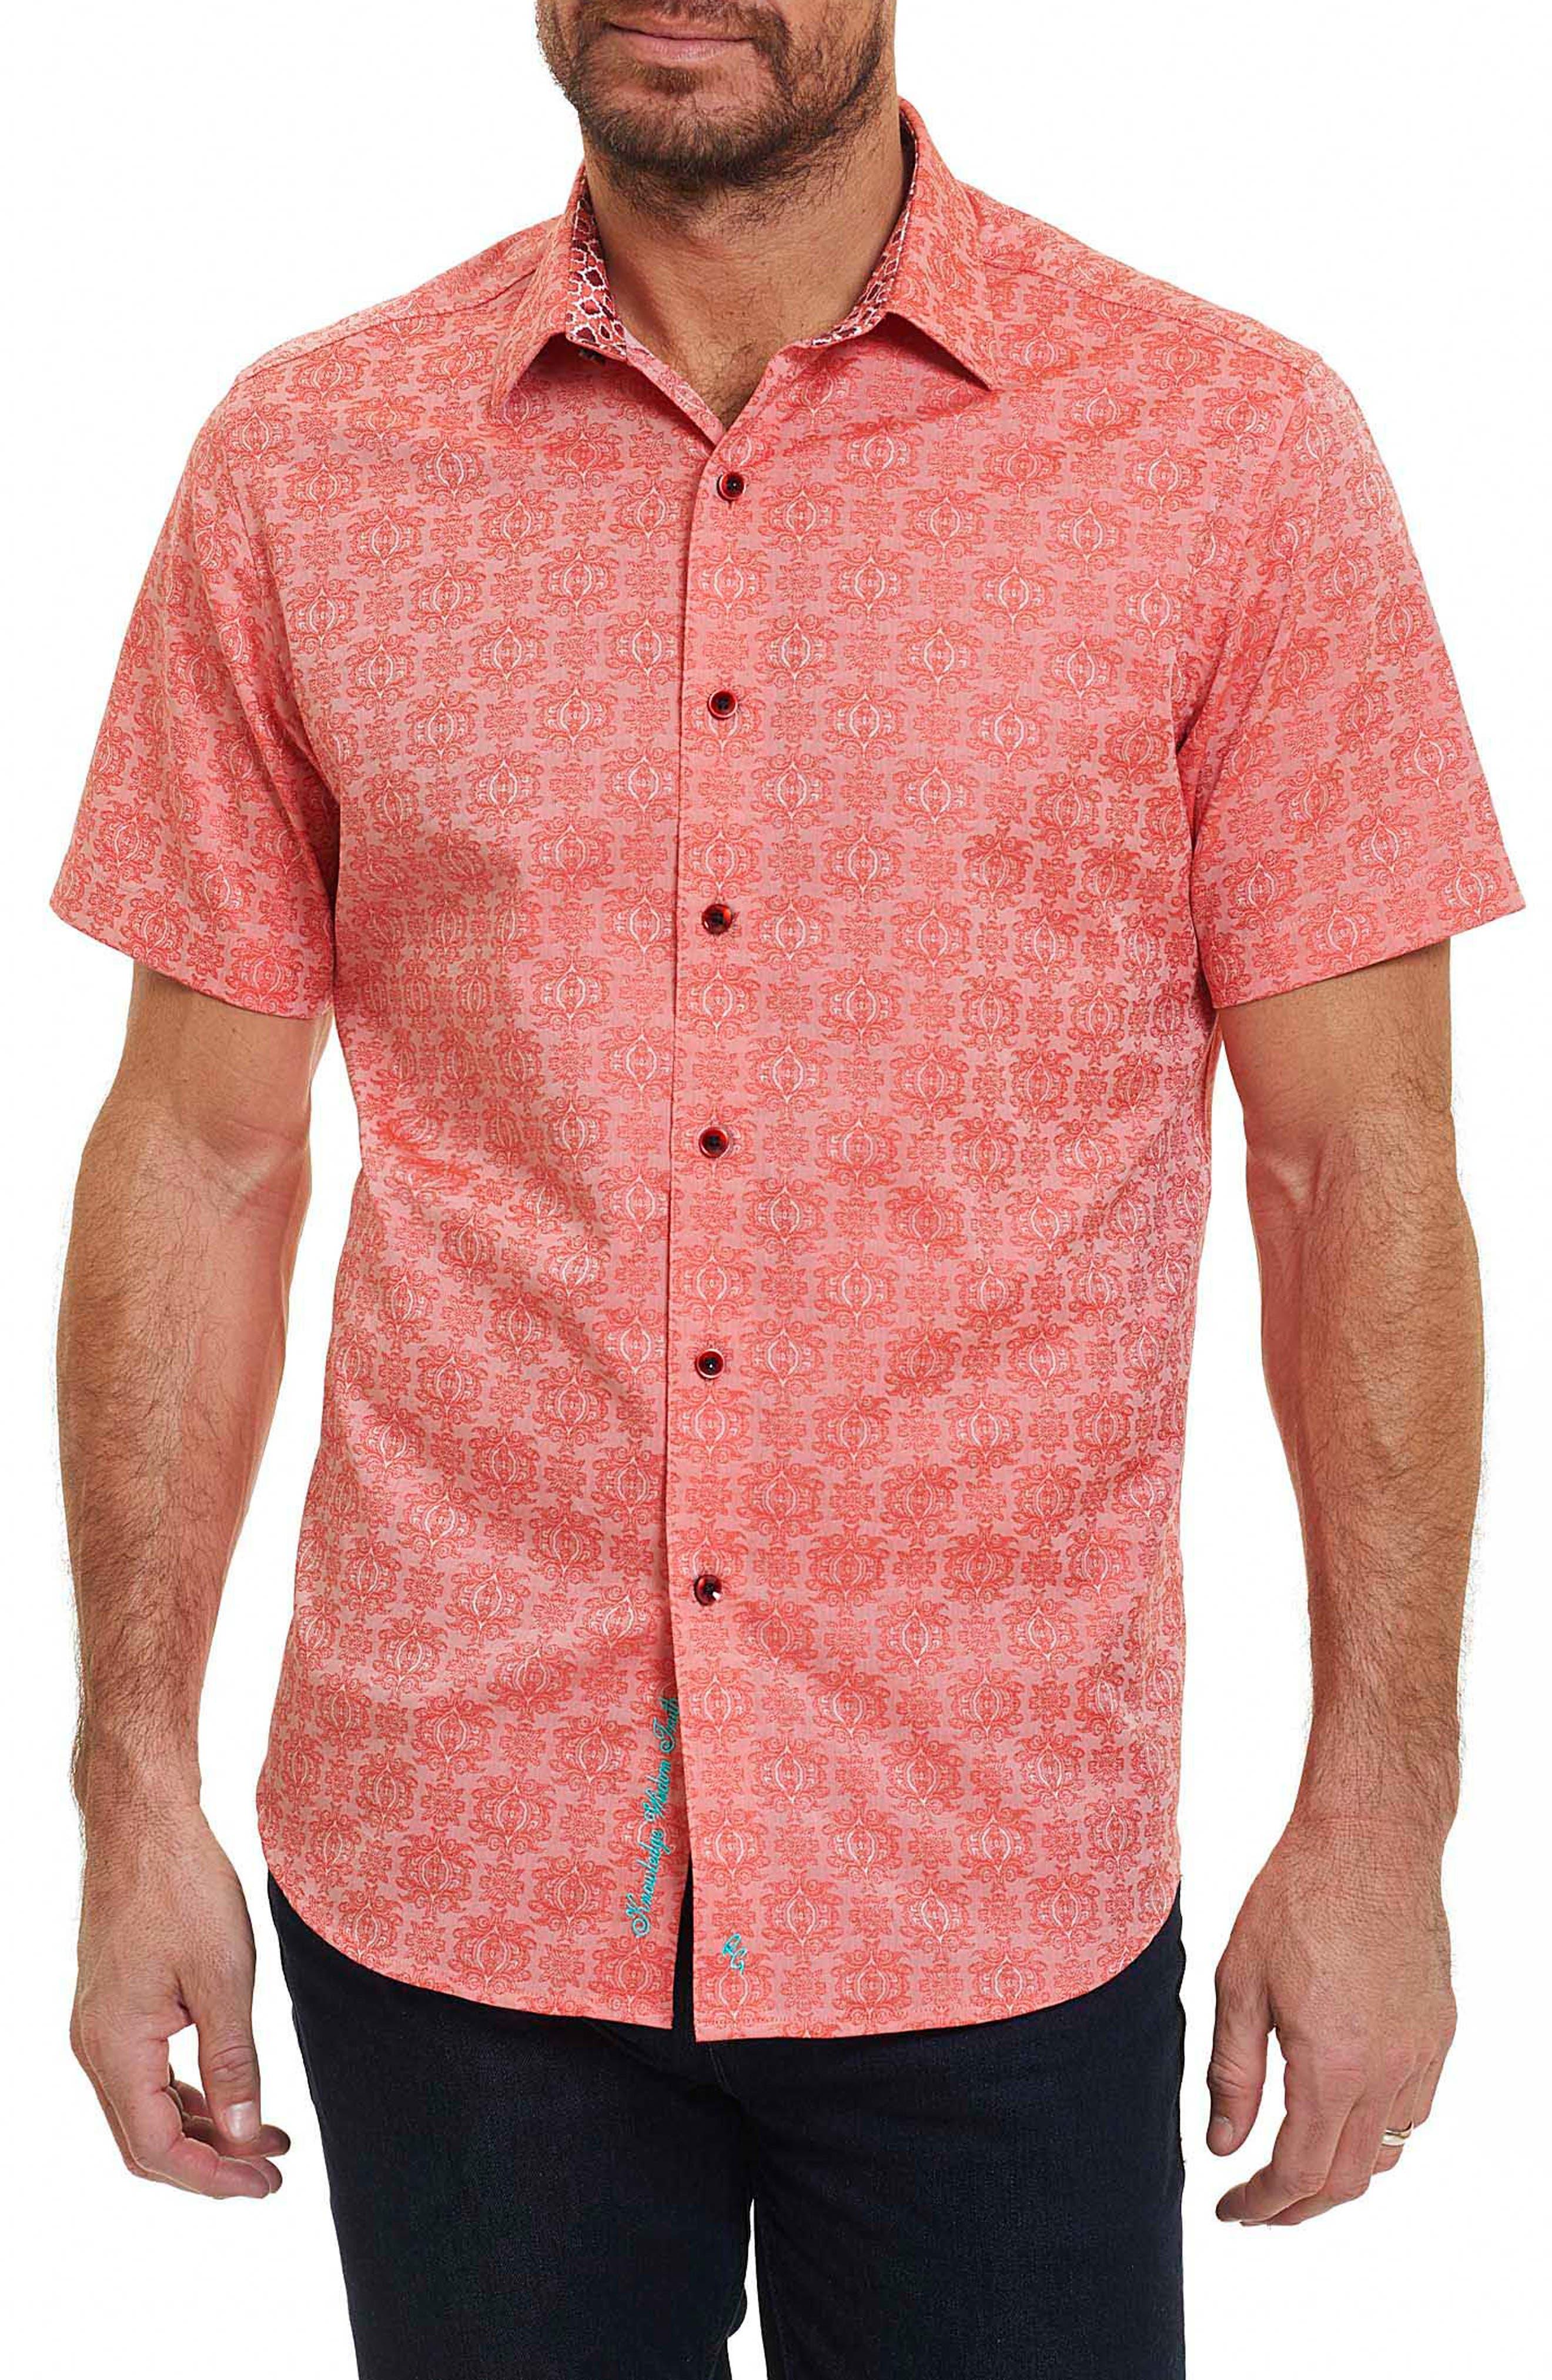 Cullen Regular Fit Sport Shirt,                             Main thumbnail 1, color,                             Coral